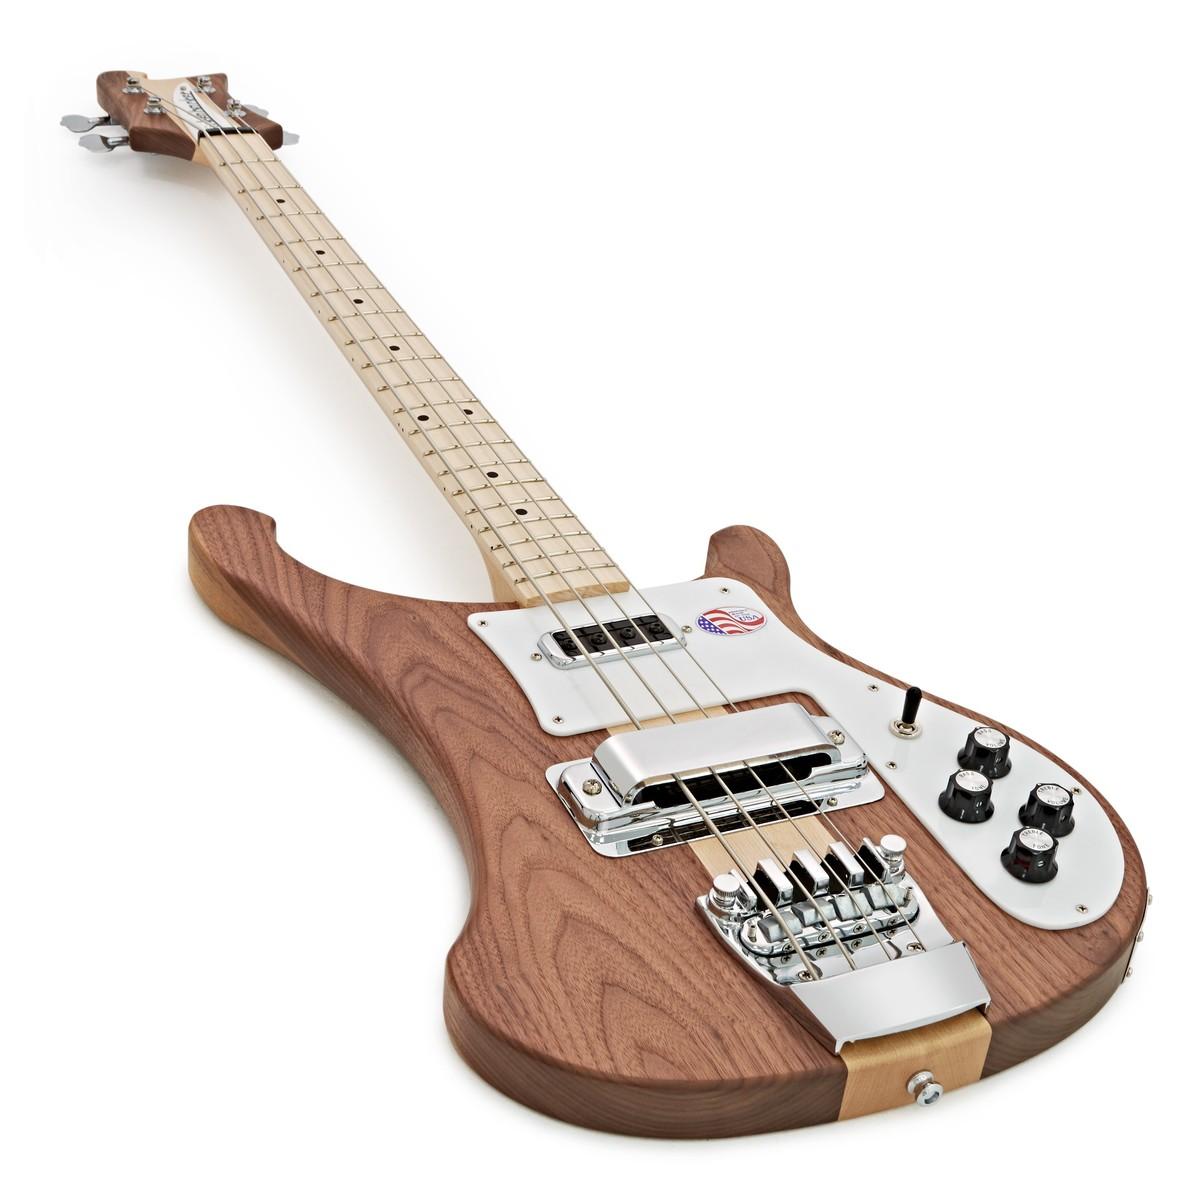 rickenbacker 4003s bass guitar walnut at gear4music. Black Bedroom Furniture Sets. Home Design Ideas